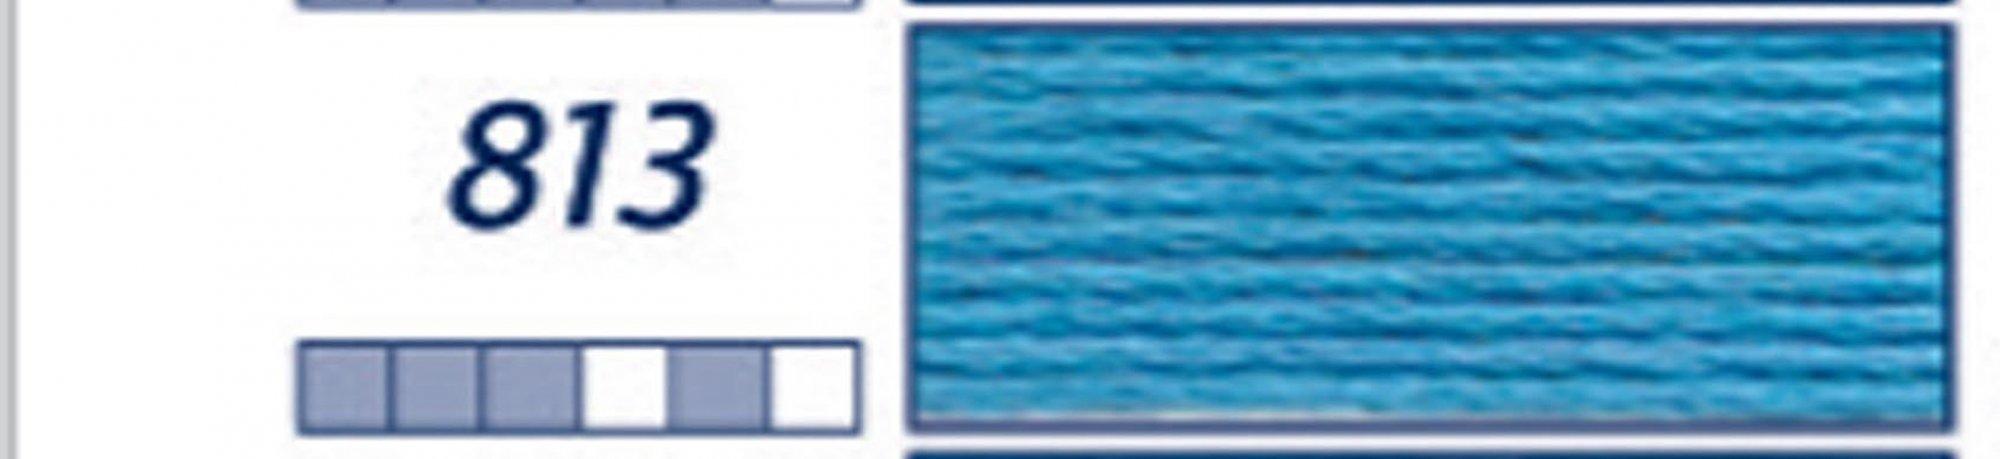 DP3-813-LT BLUE